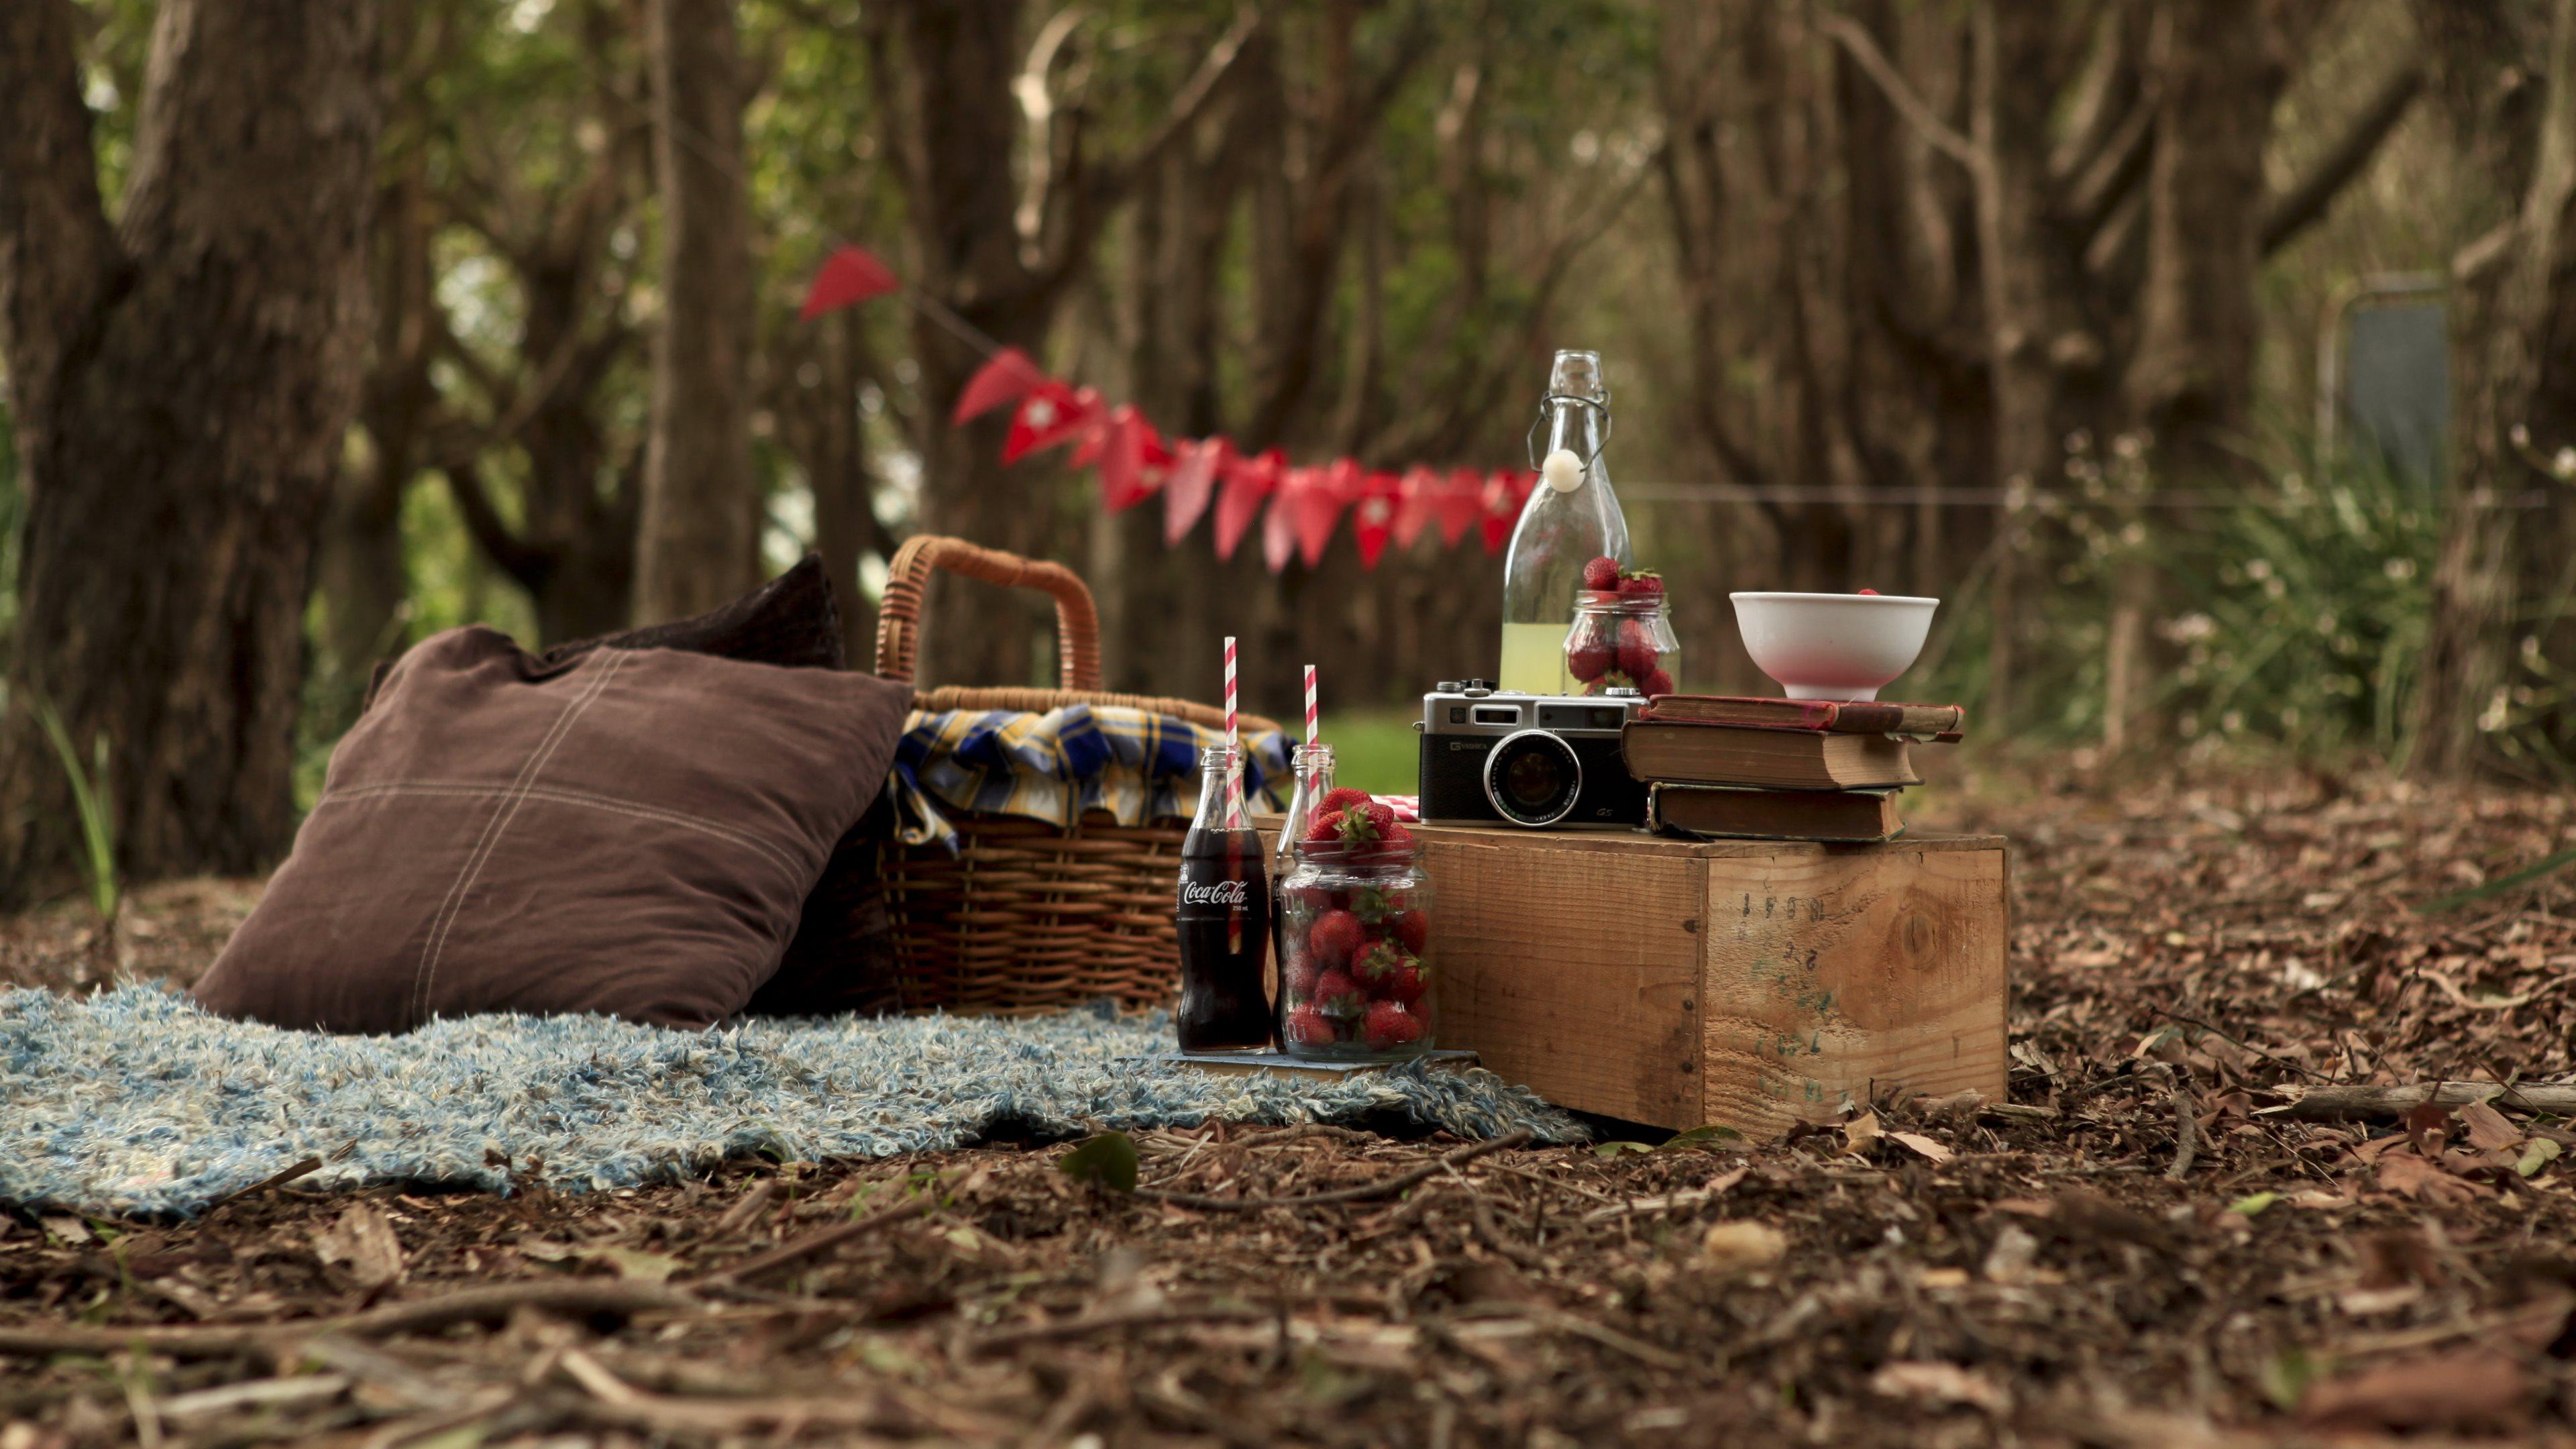 picnic widescreen hd wallpaper 60754